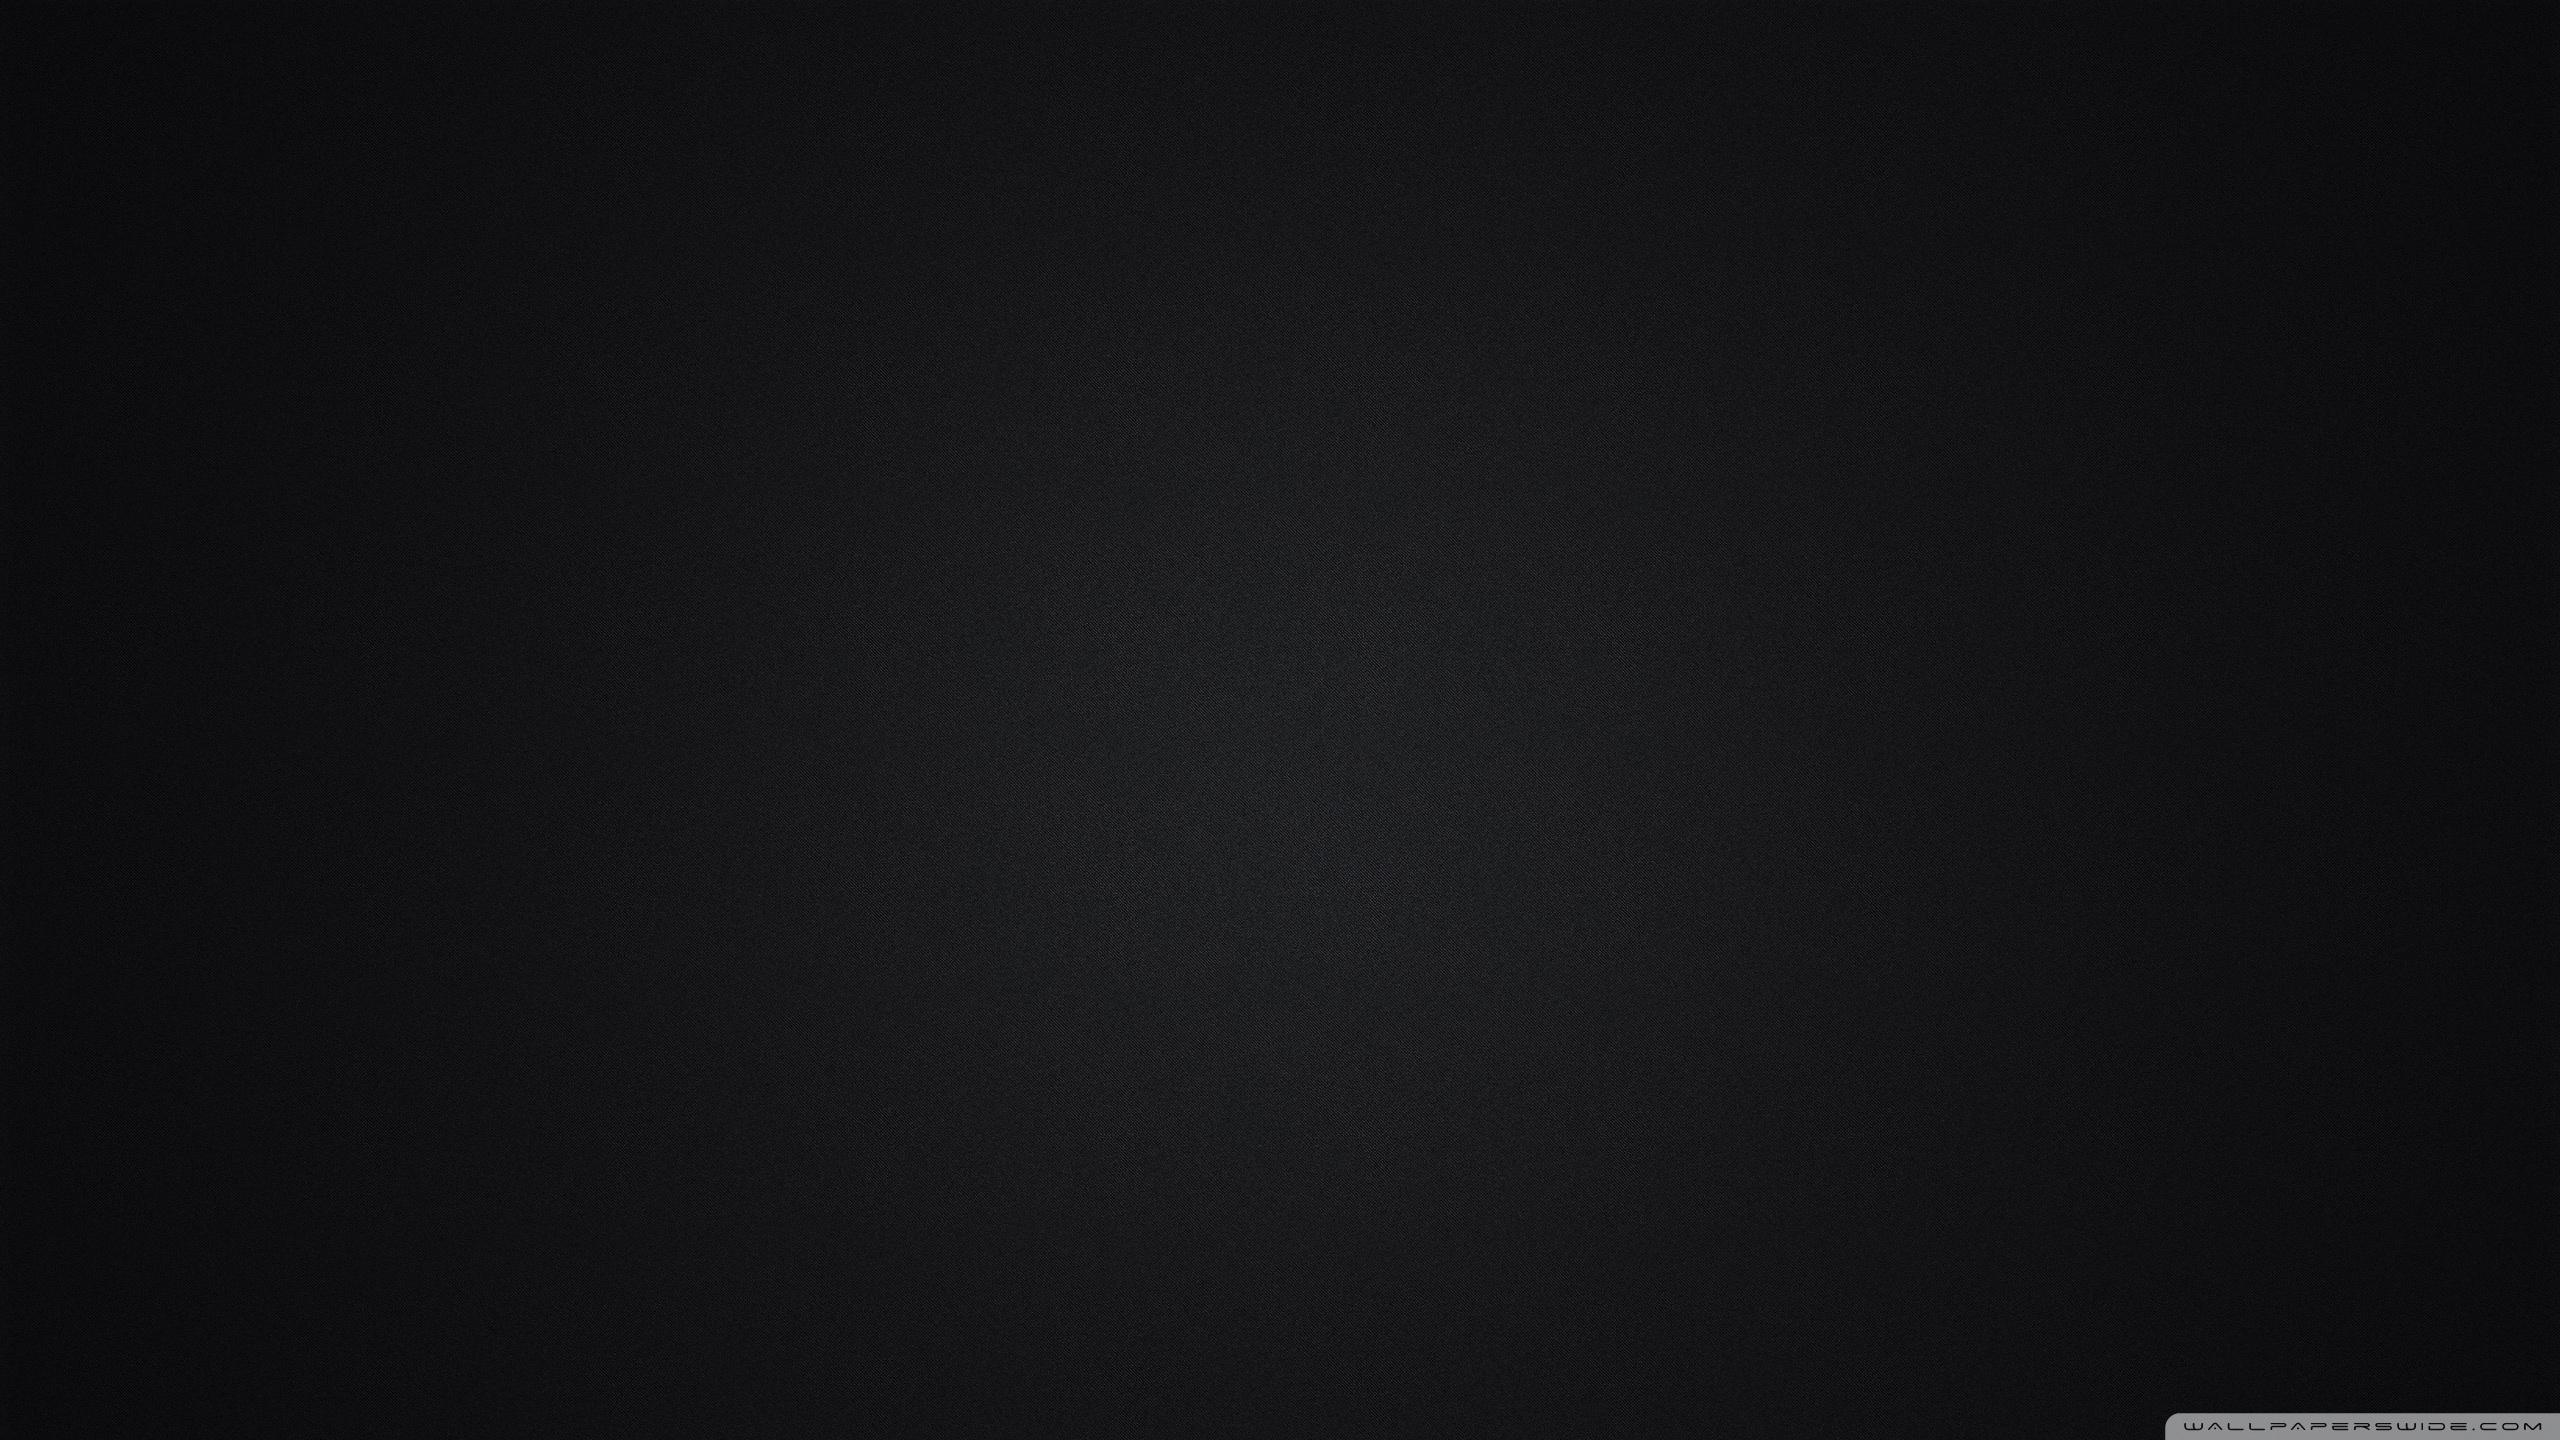 Plain black screen 2 background wallpaper for Screen ecran